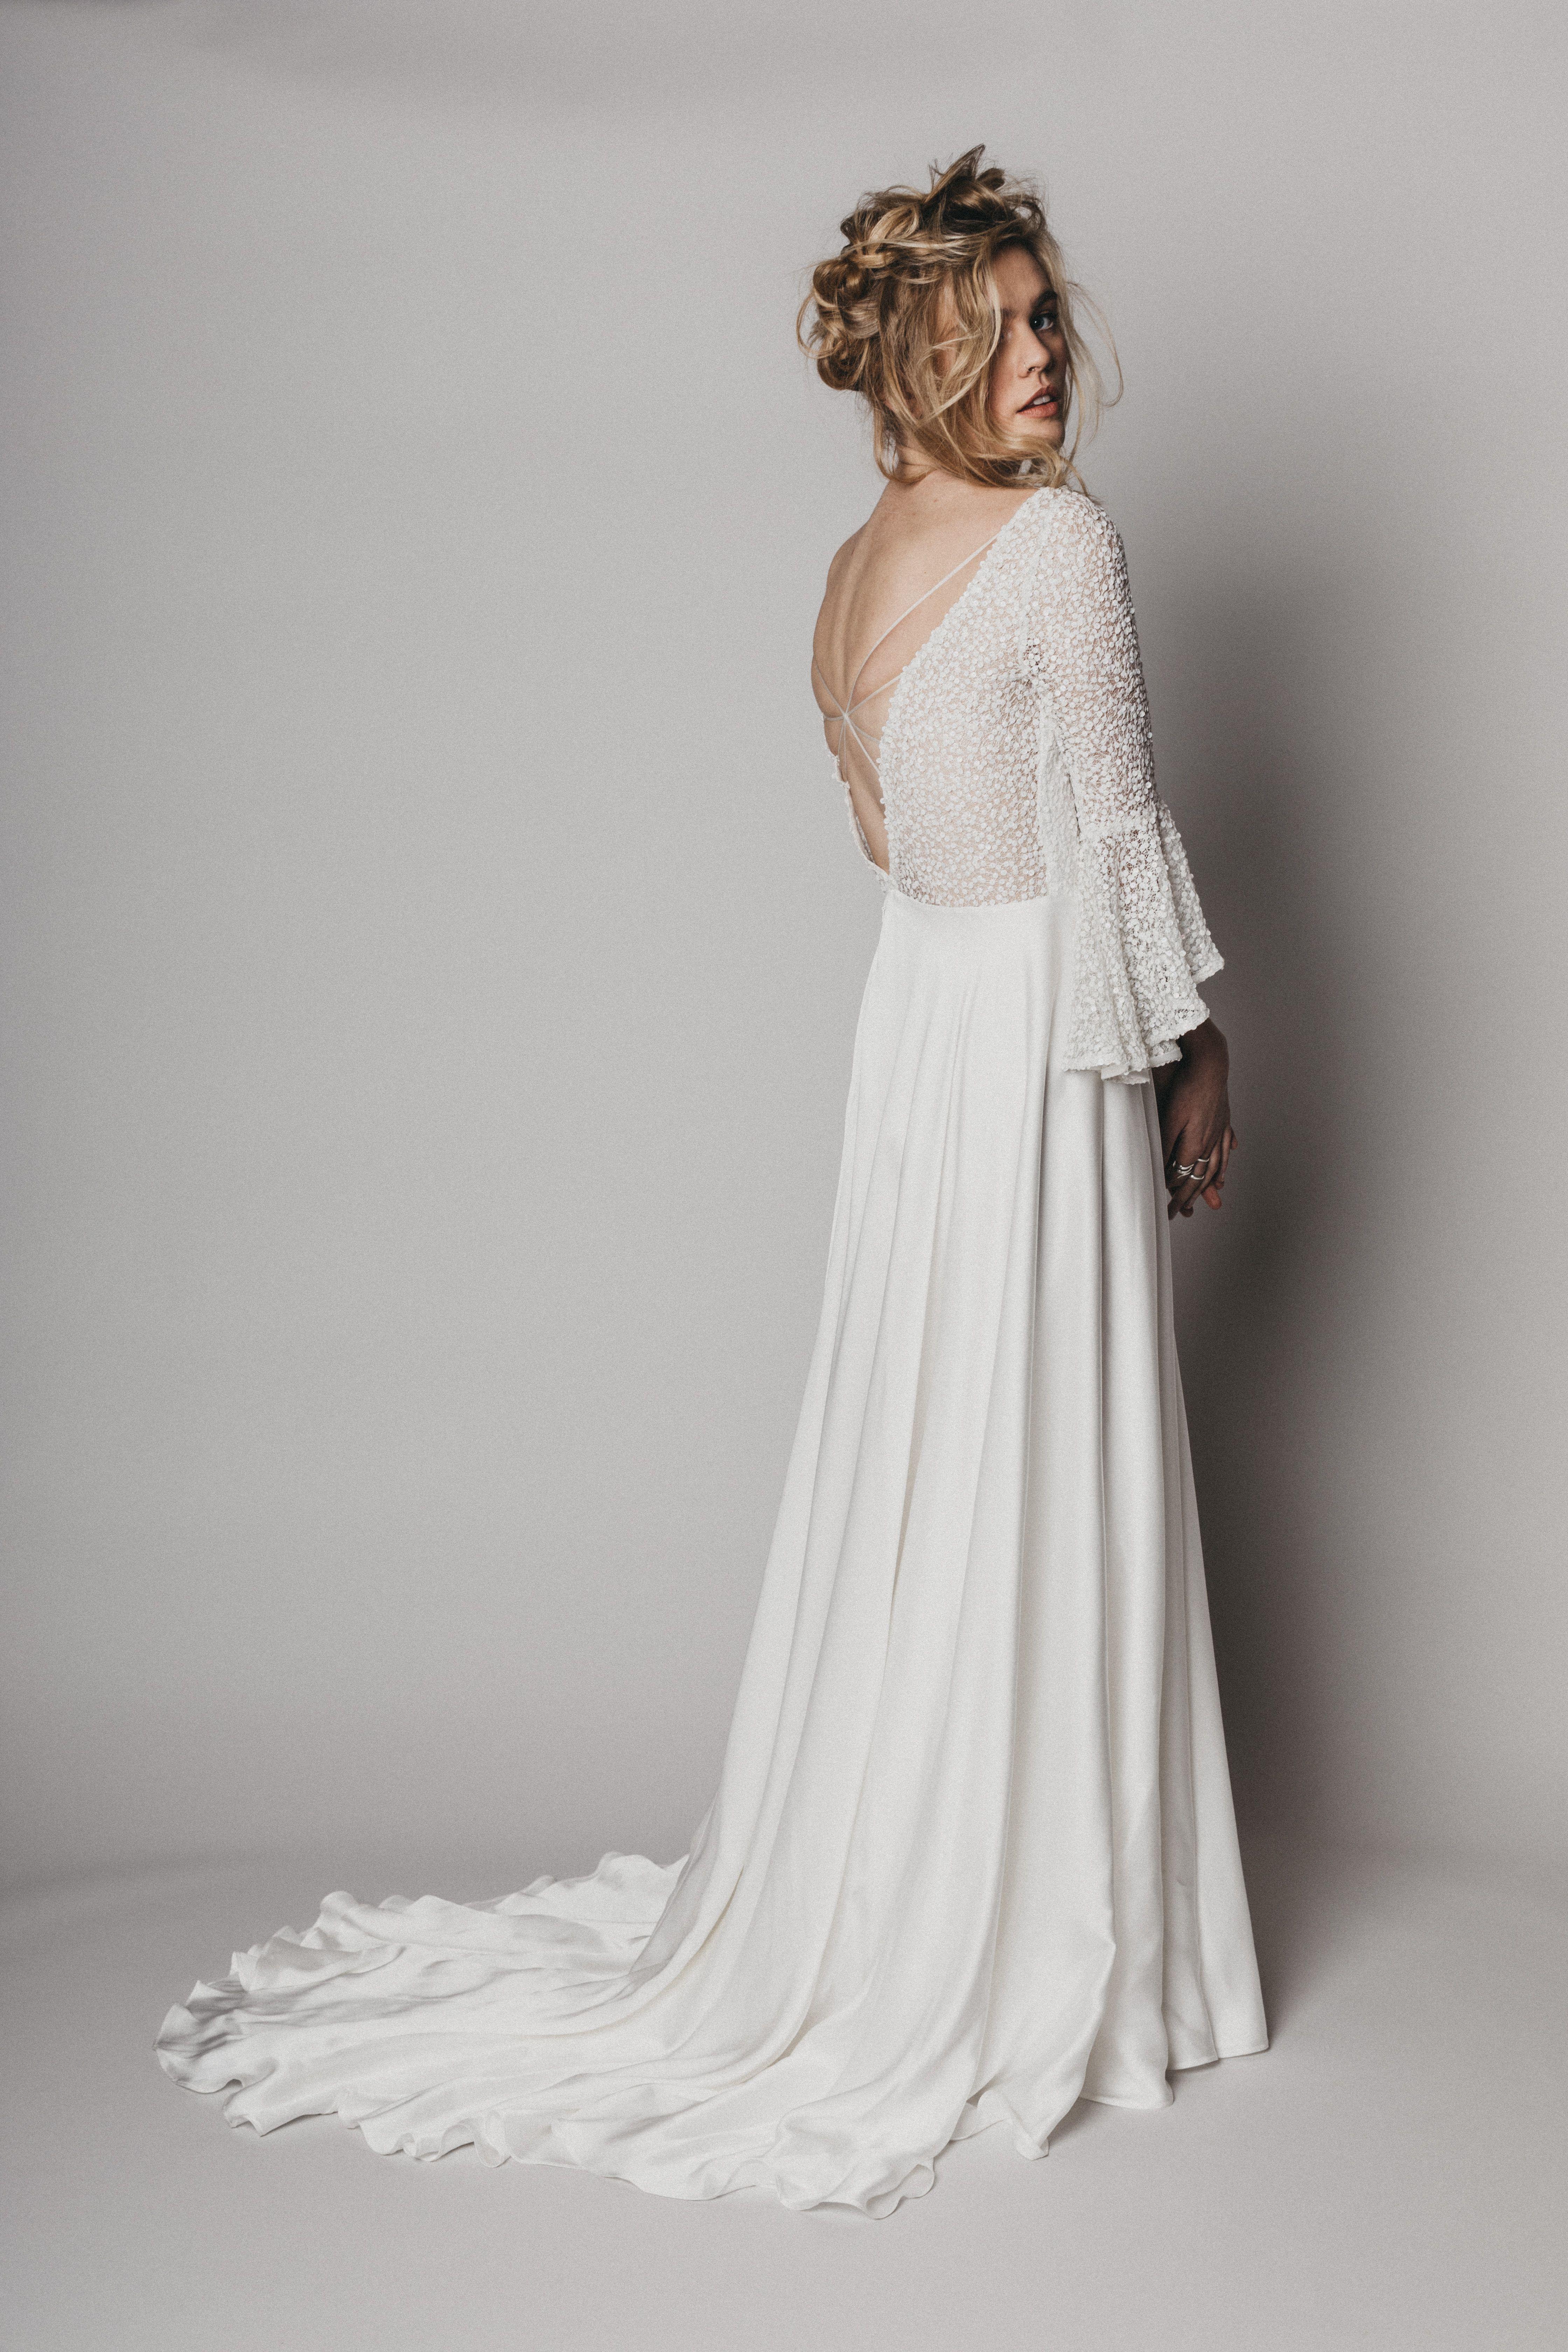 Relaxed Long Sleeve Boho Wedding Dress By Rolling In Roses Long Sleeve Wedding Dress Boho Wedding Dresses Modern Bridal Dress [ 6720 x 4480 Pixel ]